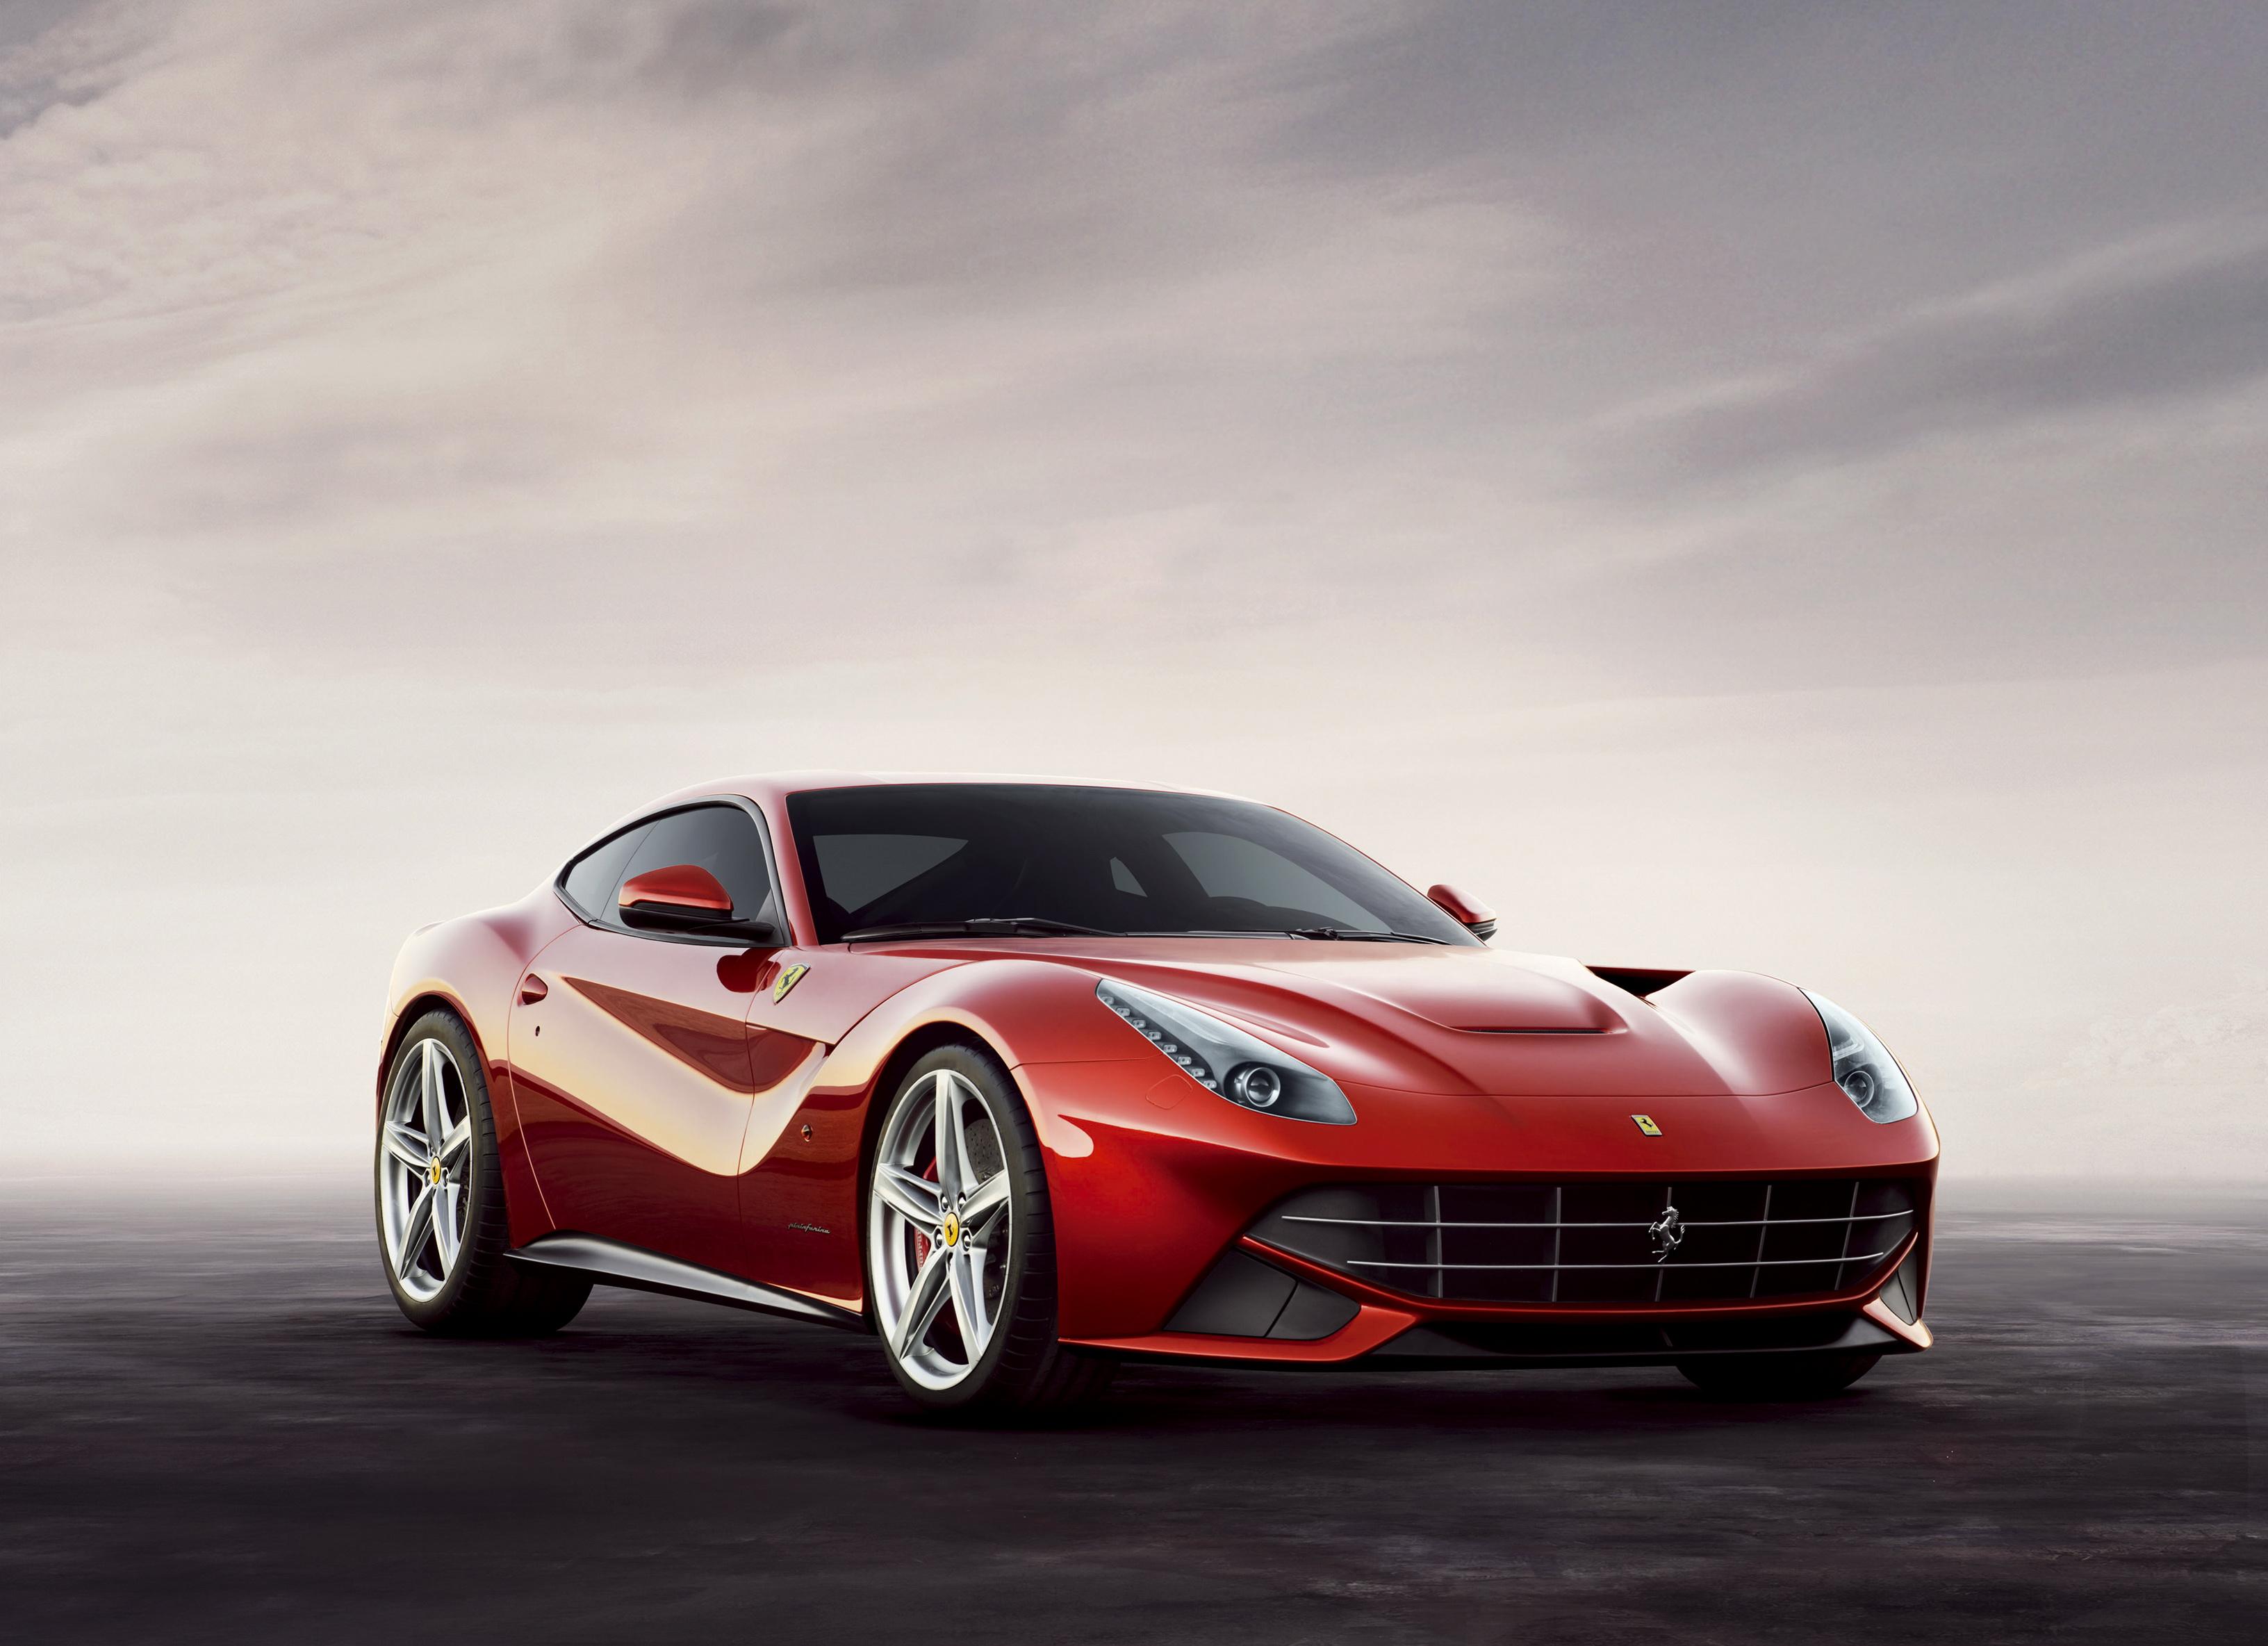 Ferrari F12 Berlinetta спорткар  № 553441  скачать